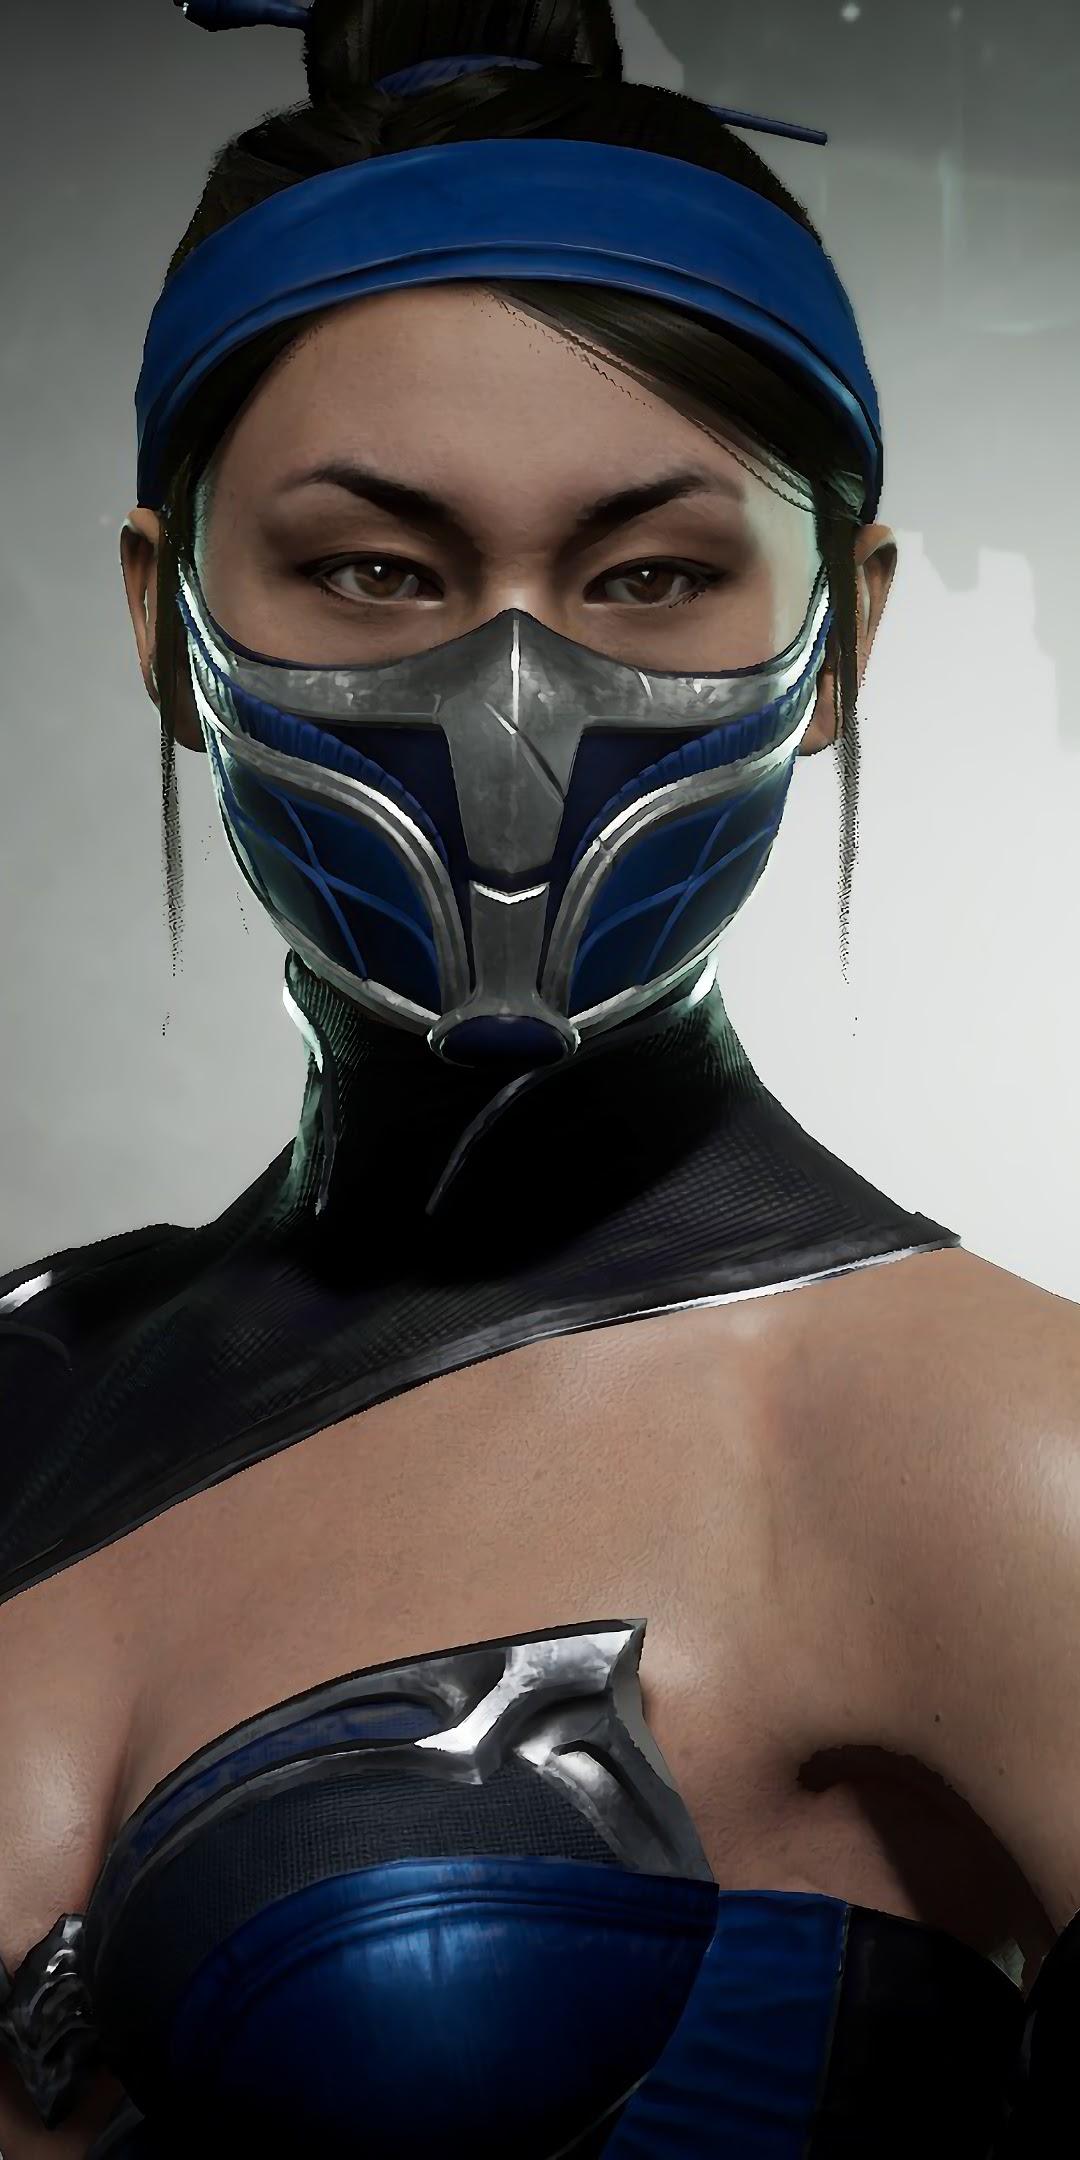 kitana without mask mortal kombat